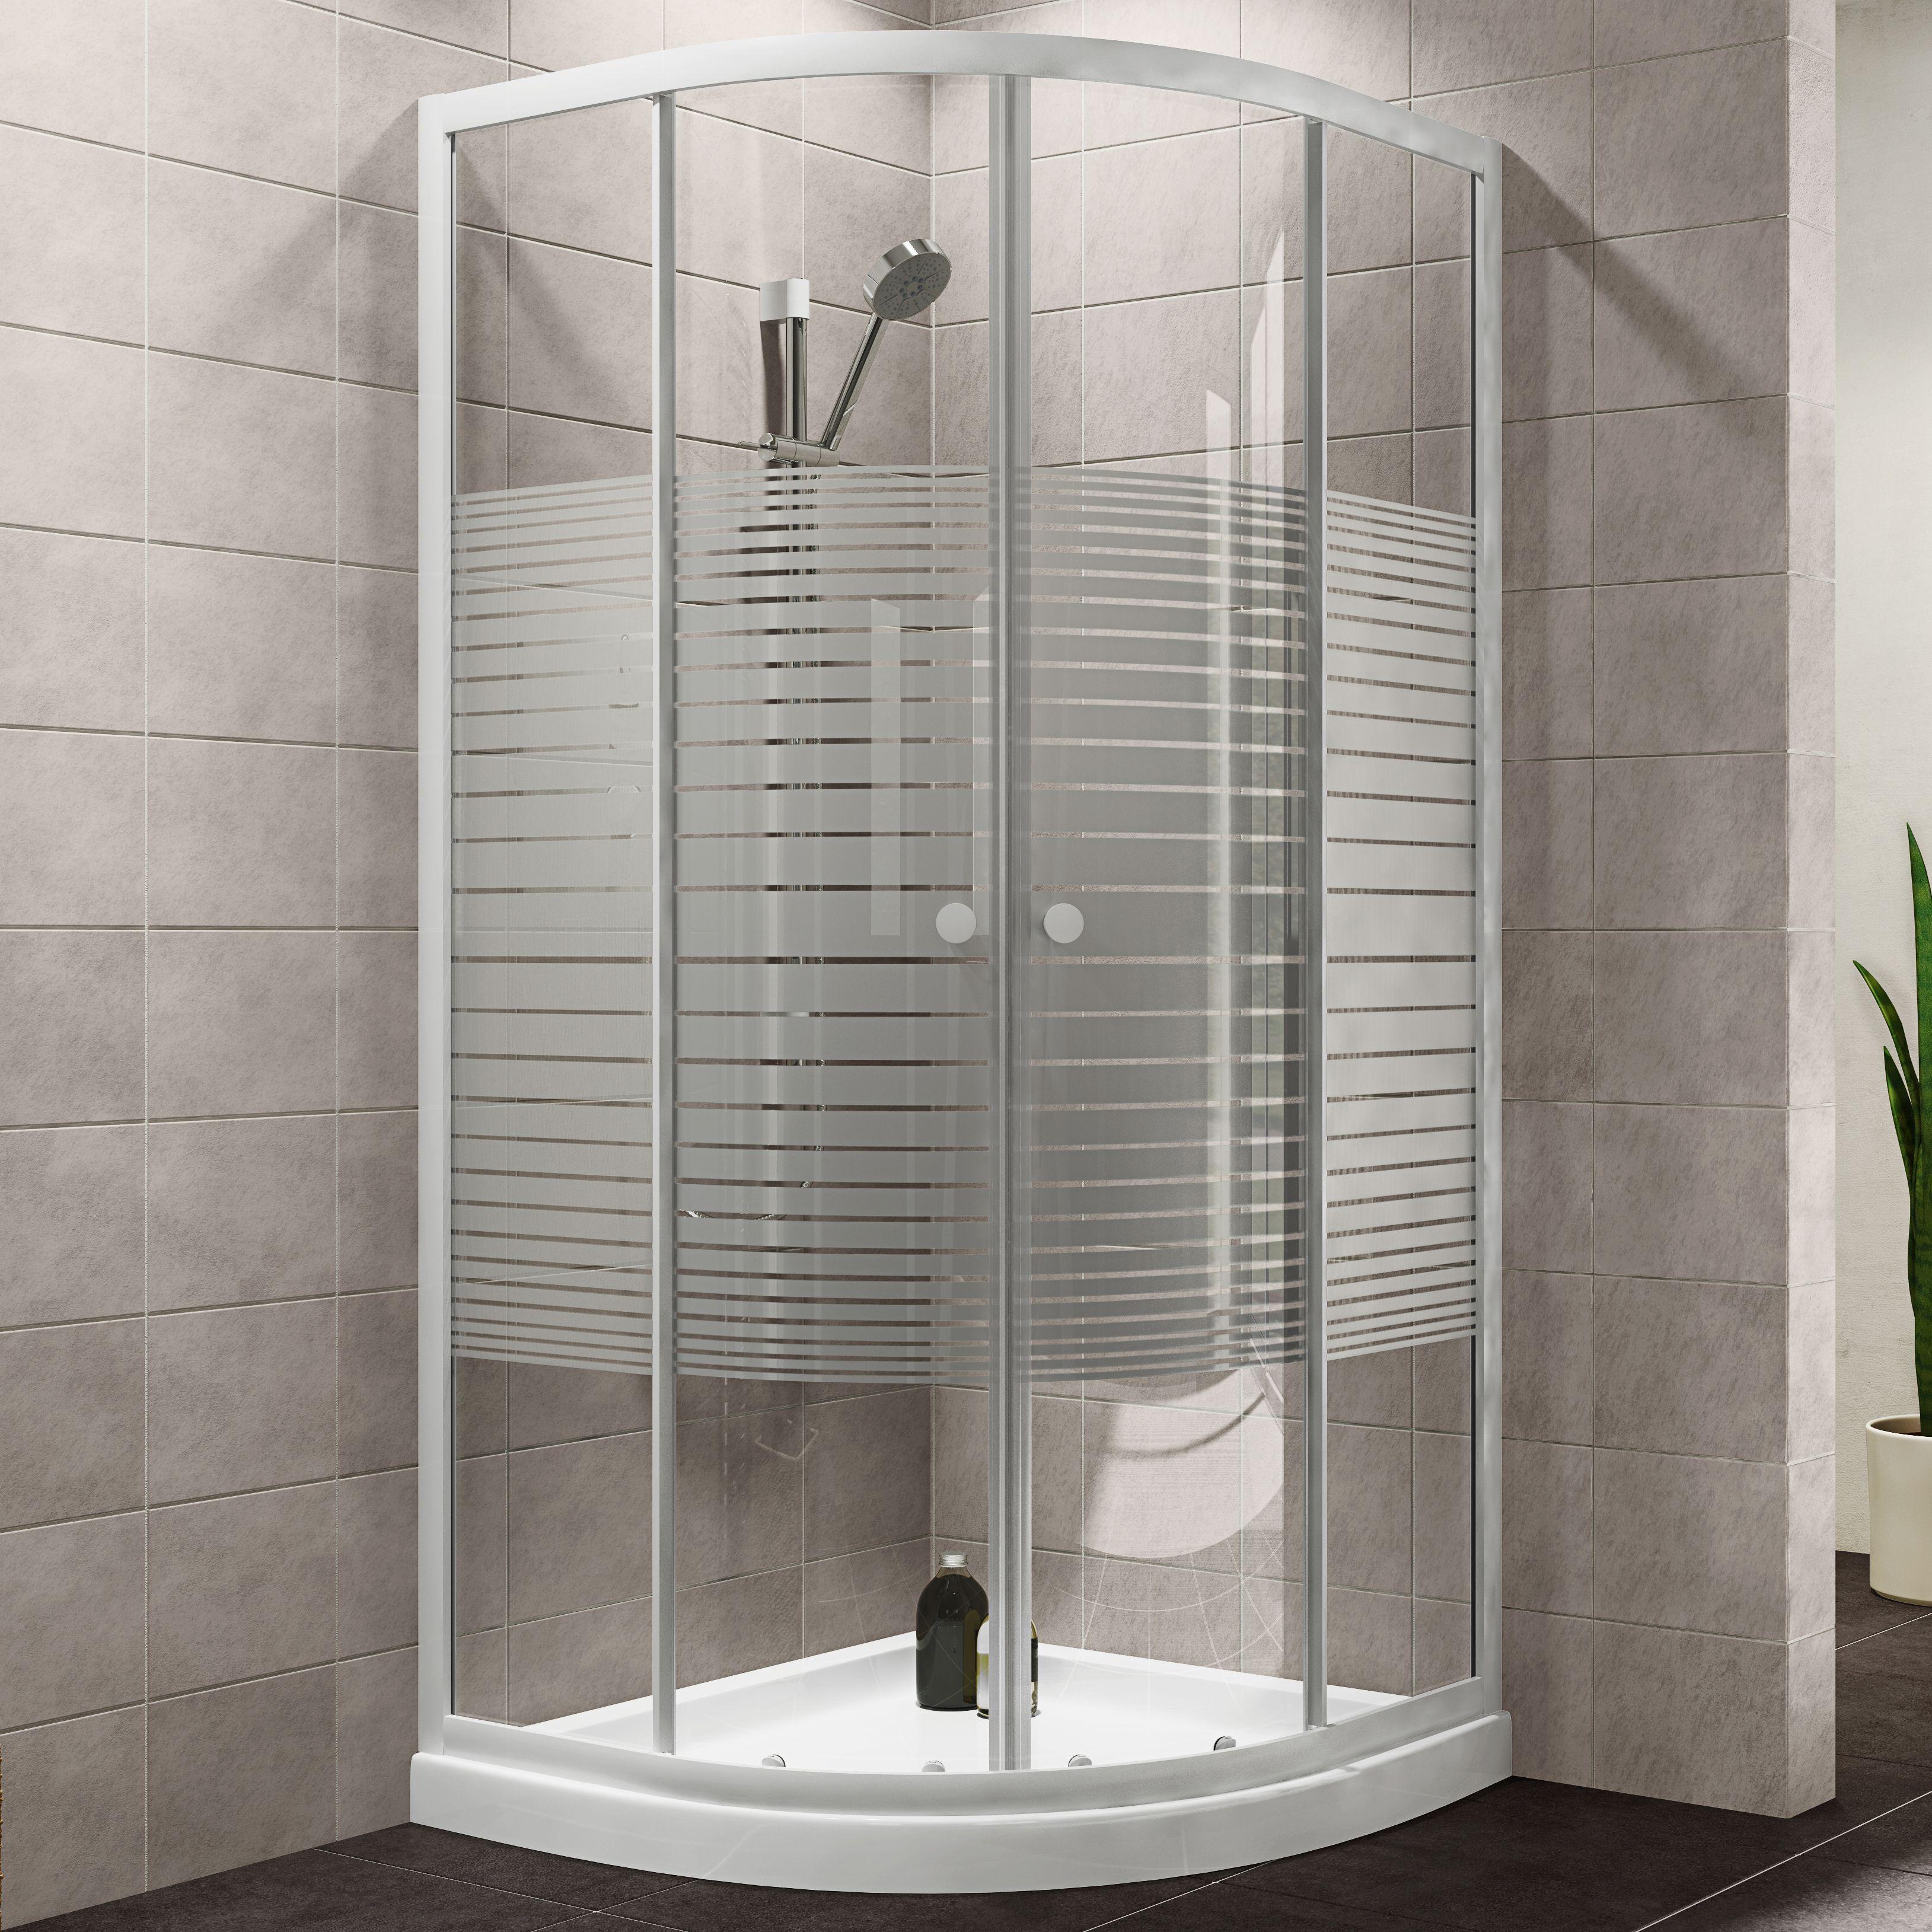 shower cubicles. Plumbsure Quadrant Shower Enclosure With Double Sliding Doors \u0026 Striped Glass (W)800mm (D)800mm | Departments DIY At B\u0026Q Cubicles